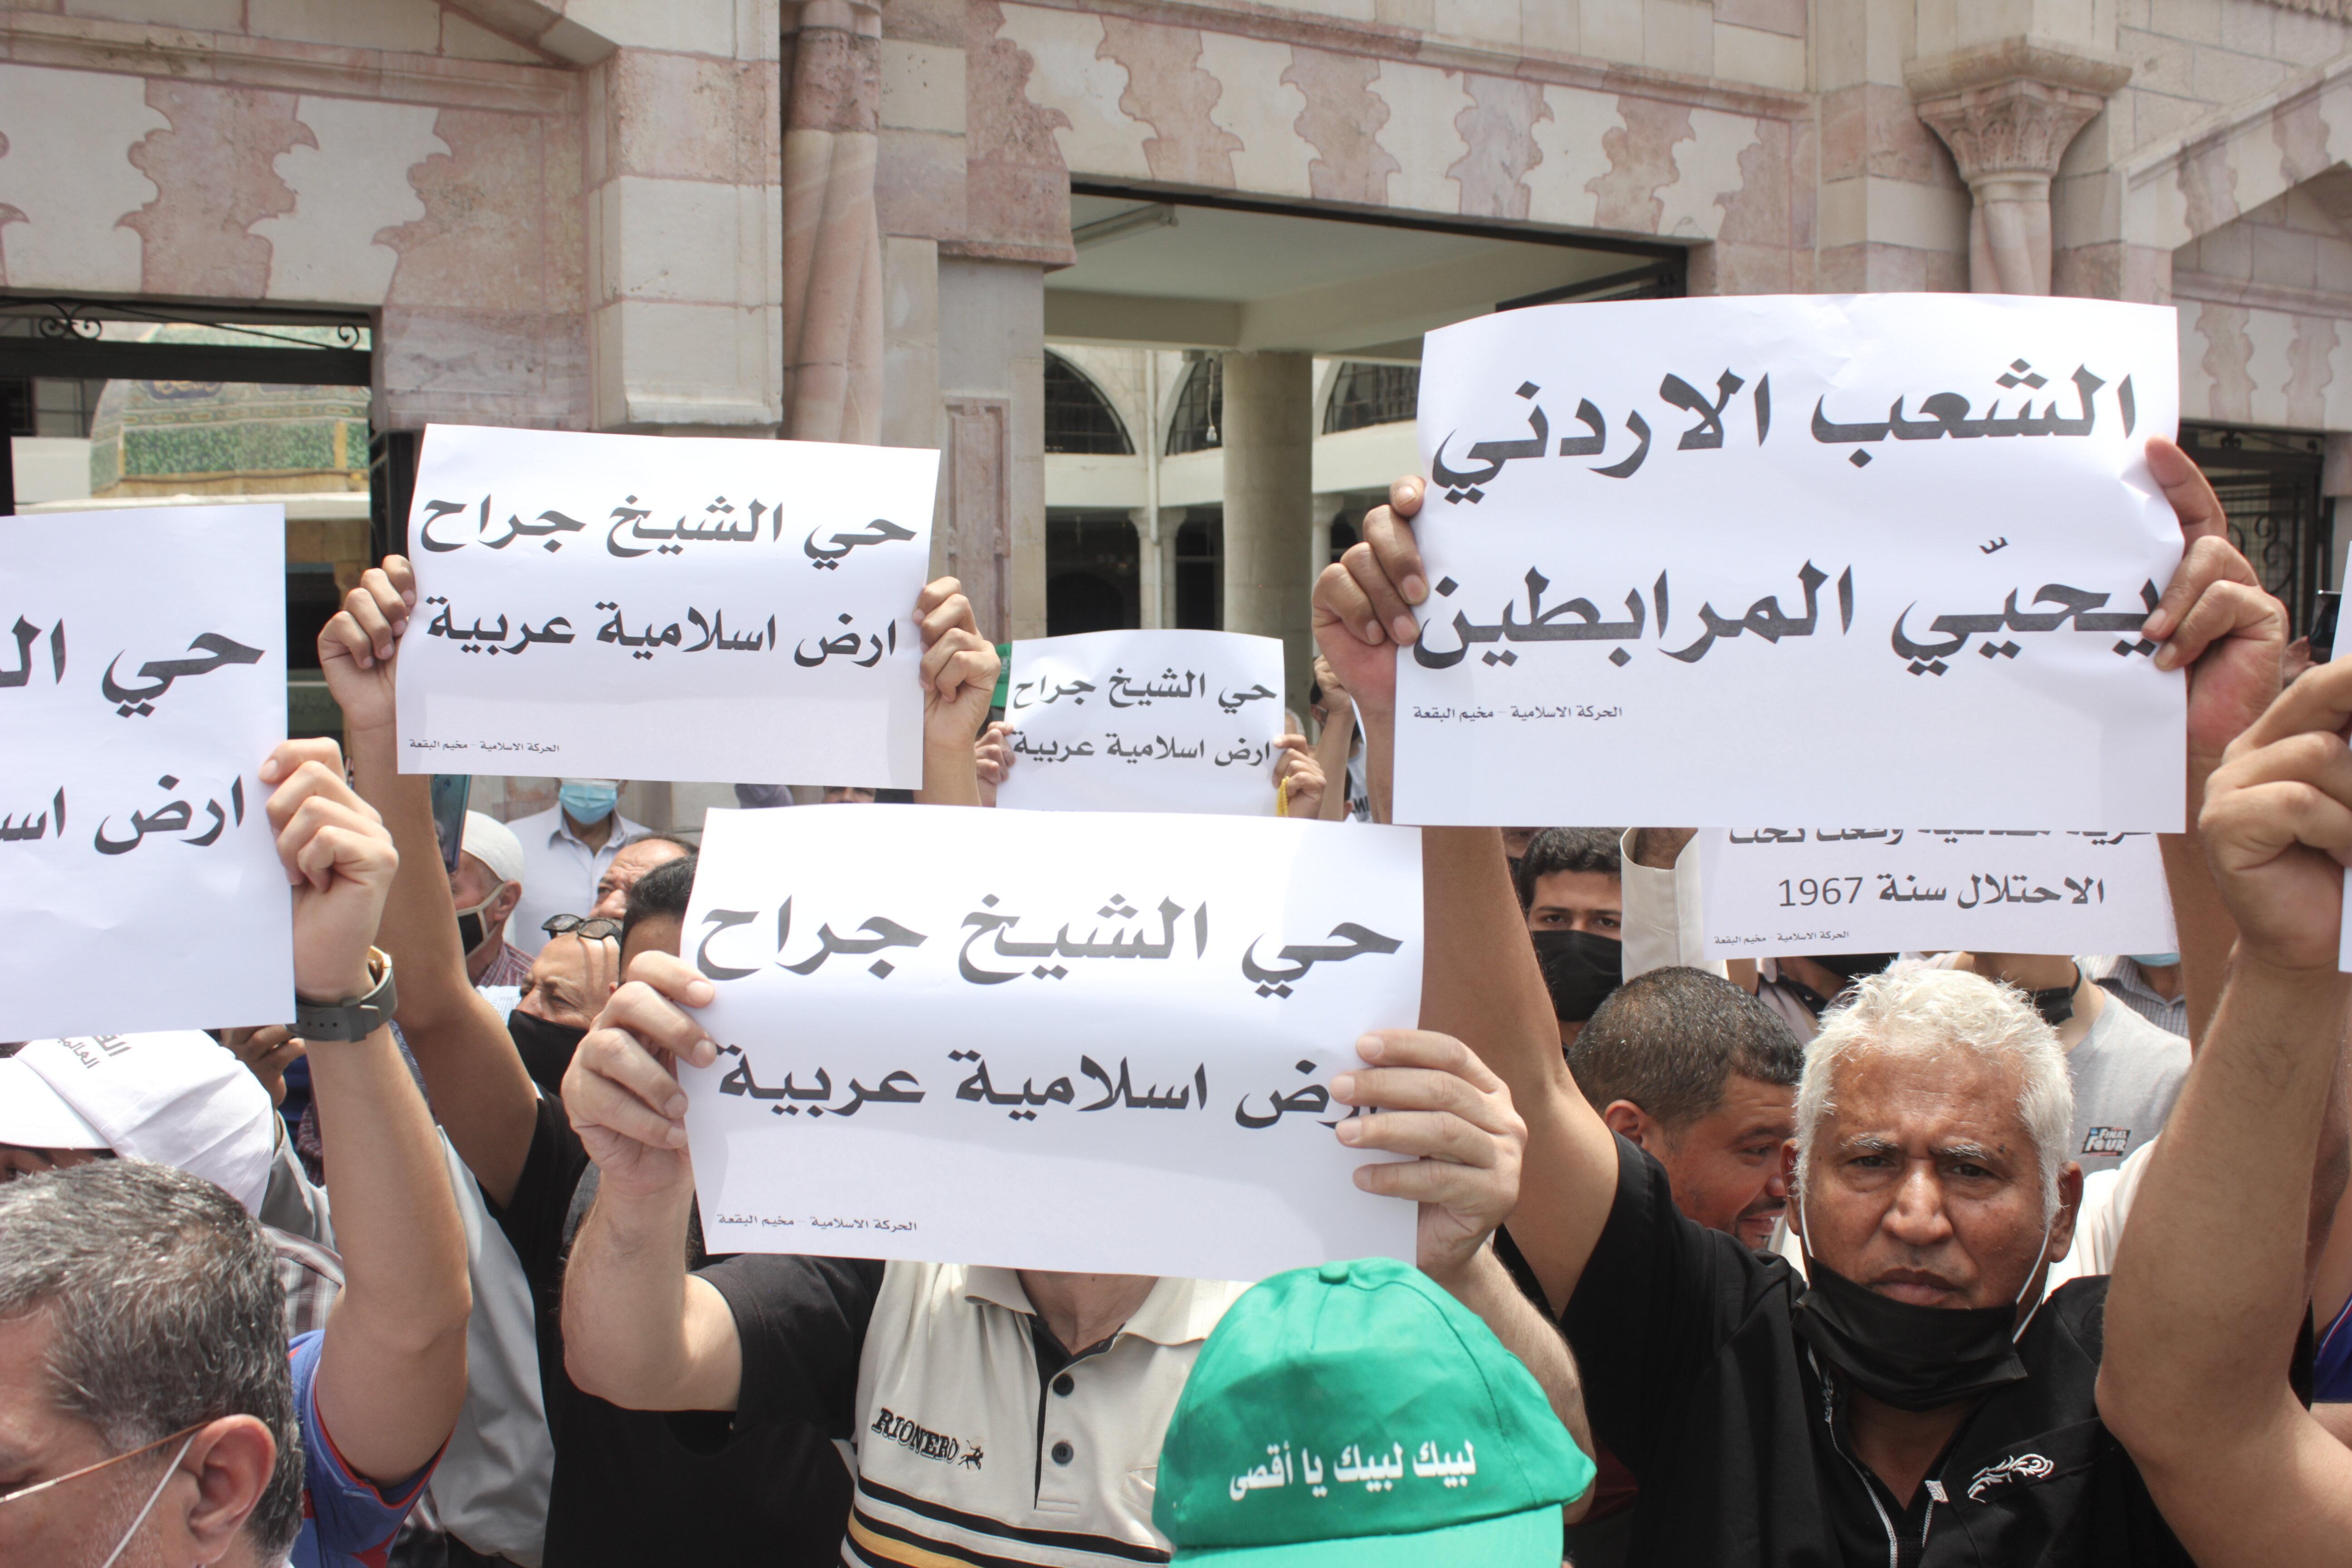 Protest in Jordan against eviction of Palestinians in Jerusalem